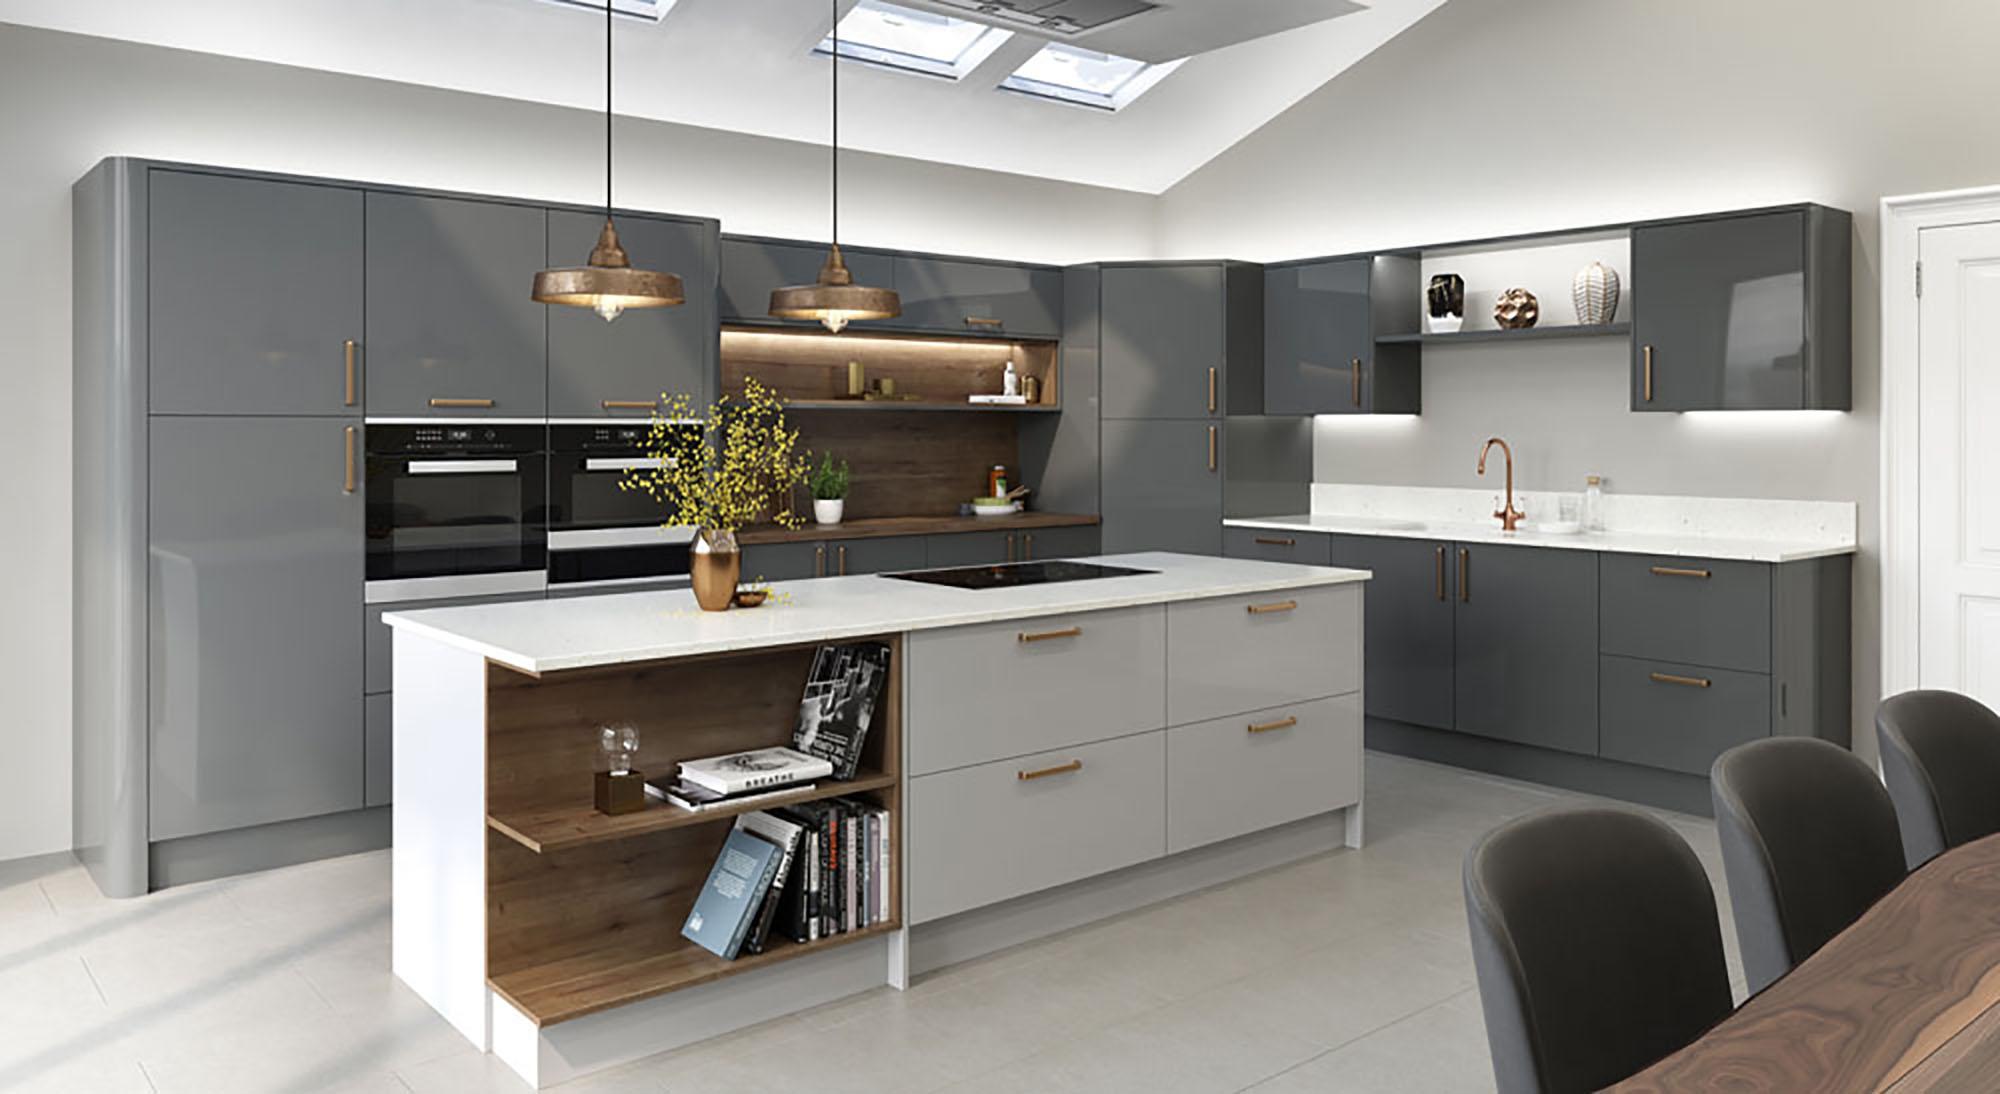 Outstanding Kitchen Design Scotland Inspiration - Kitchen Cabinets ...